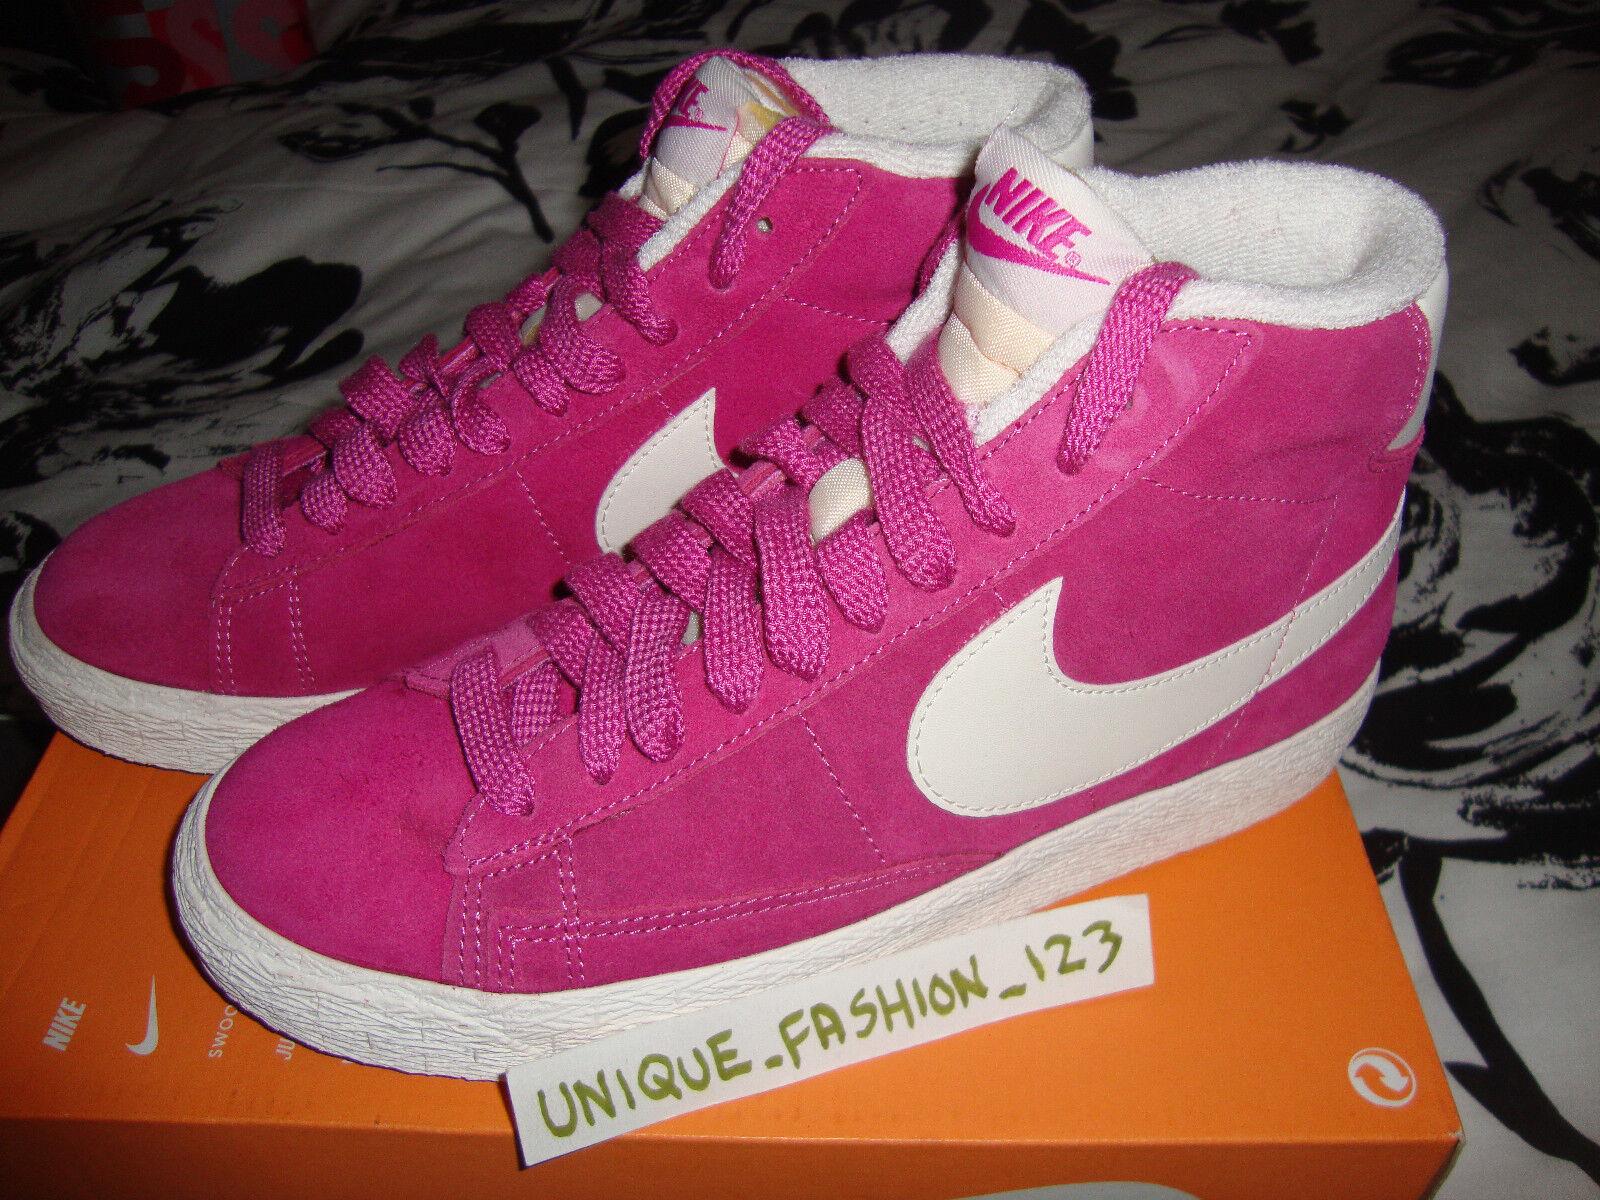 Wmns Nike Blazer Mid Suede Vintage Club Rosa VNTG 38.5 36 LIBERTY